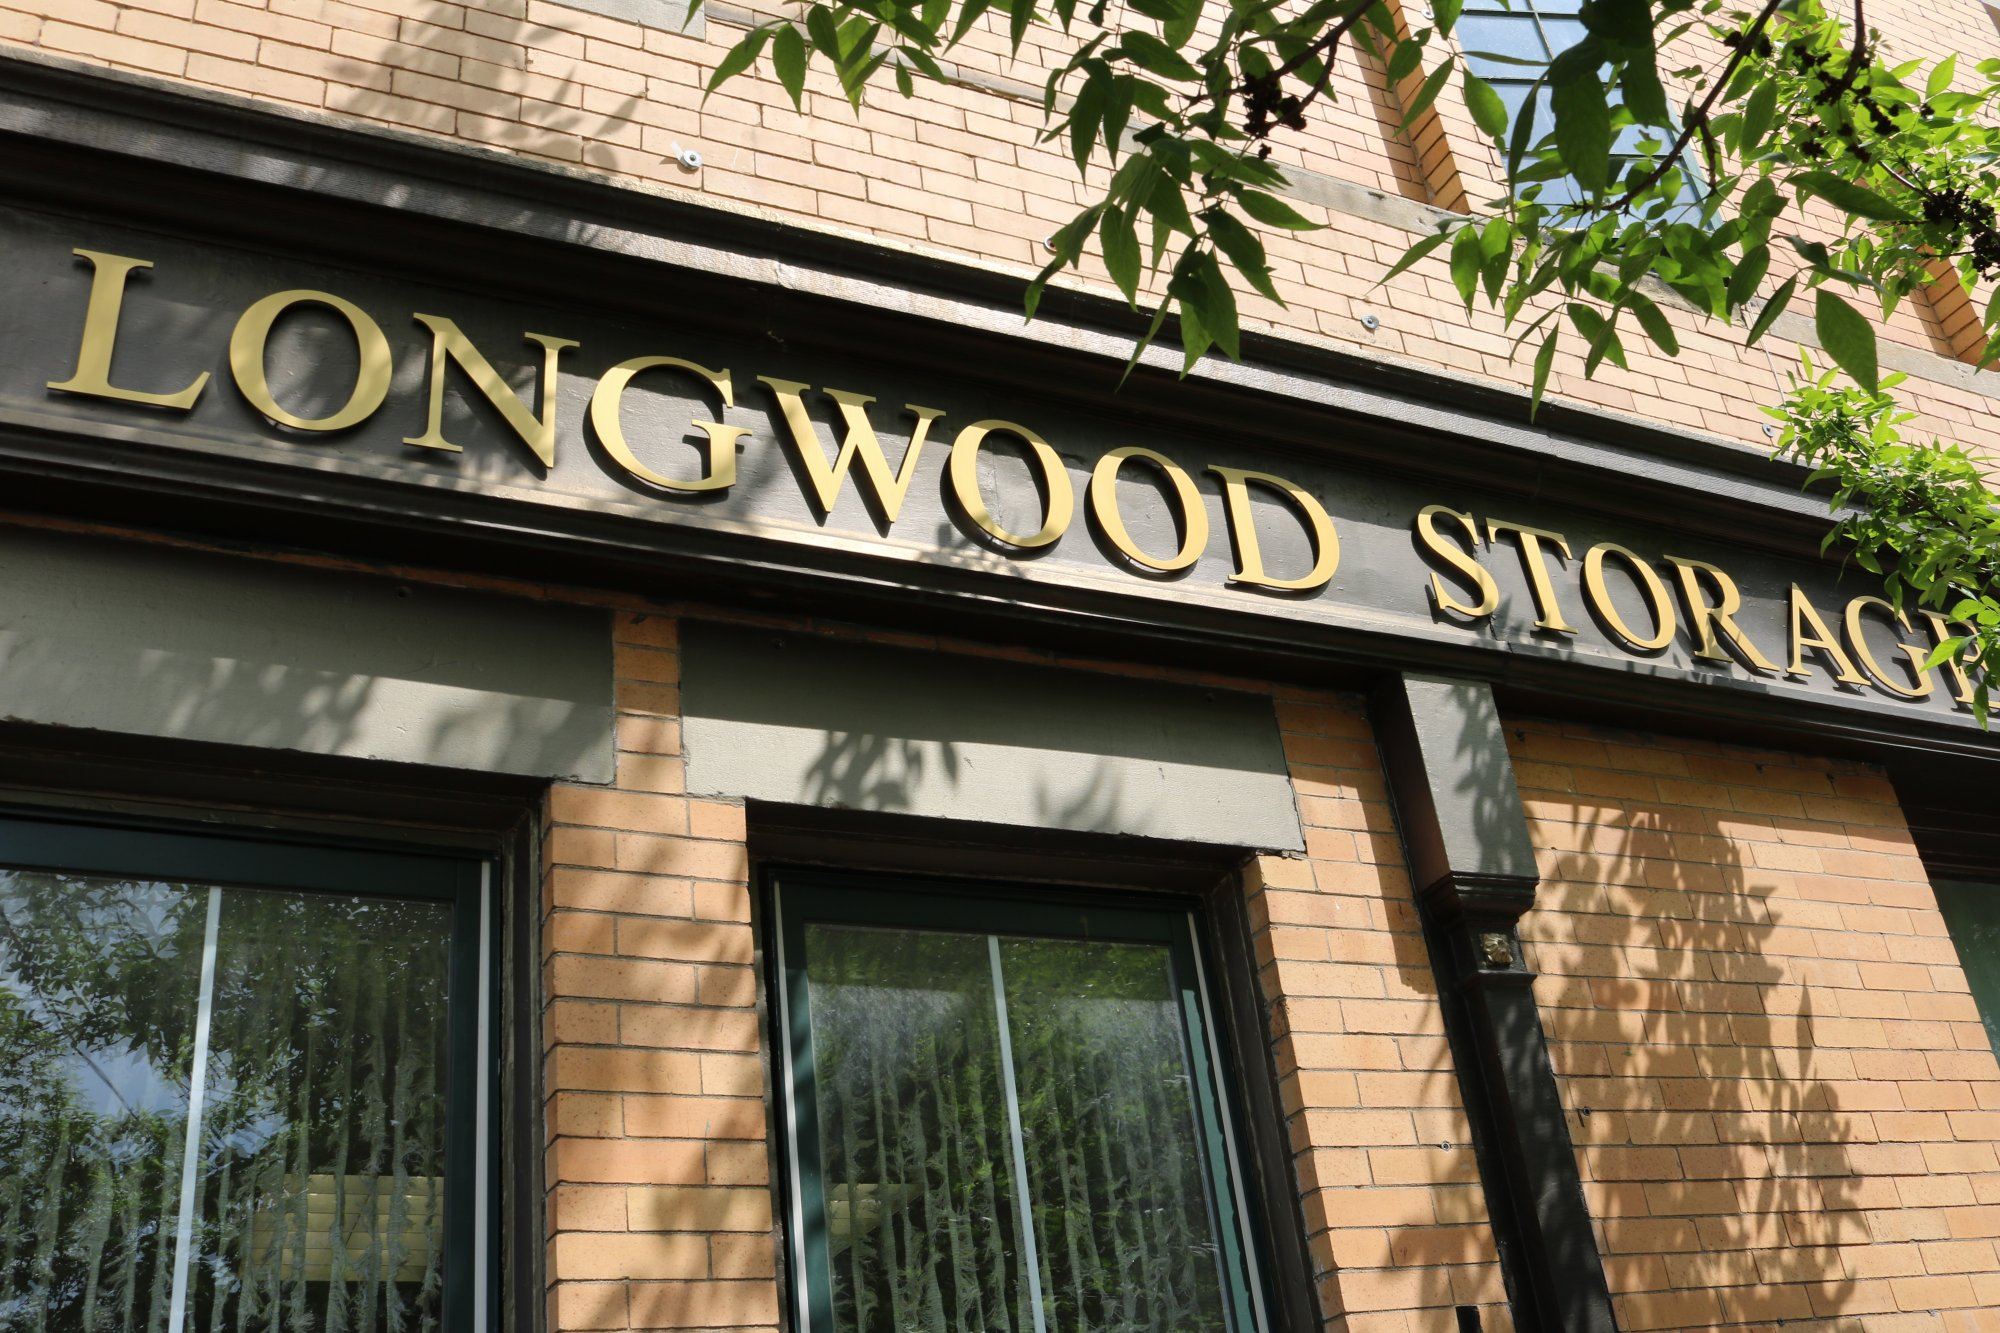 Longwood Storage